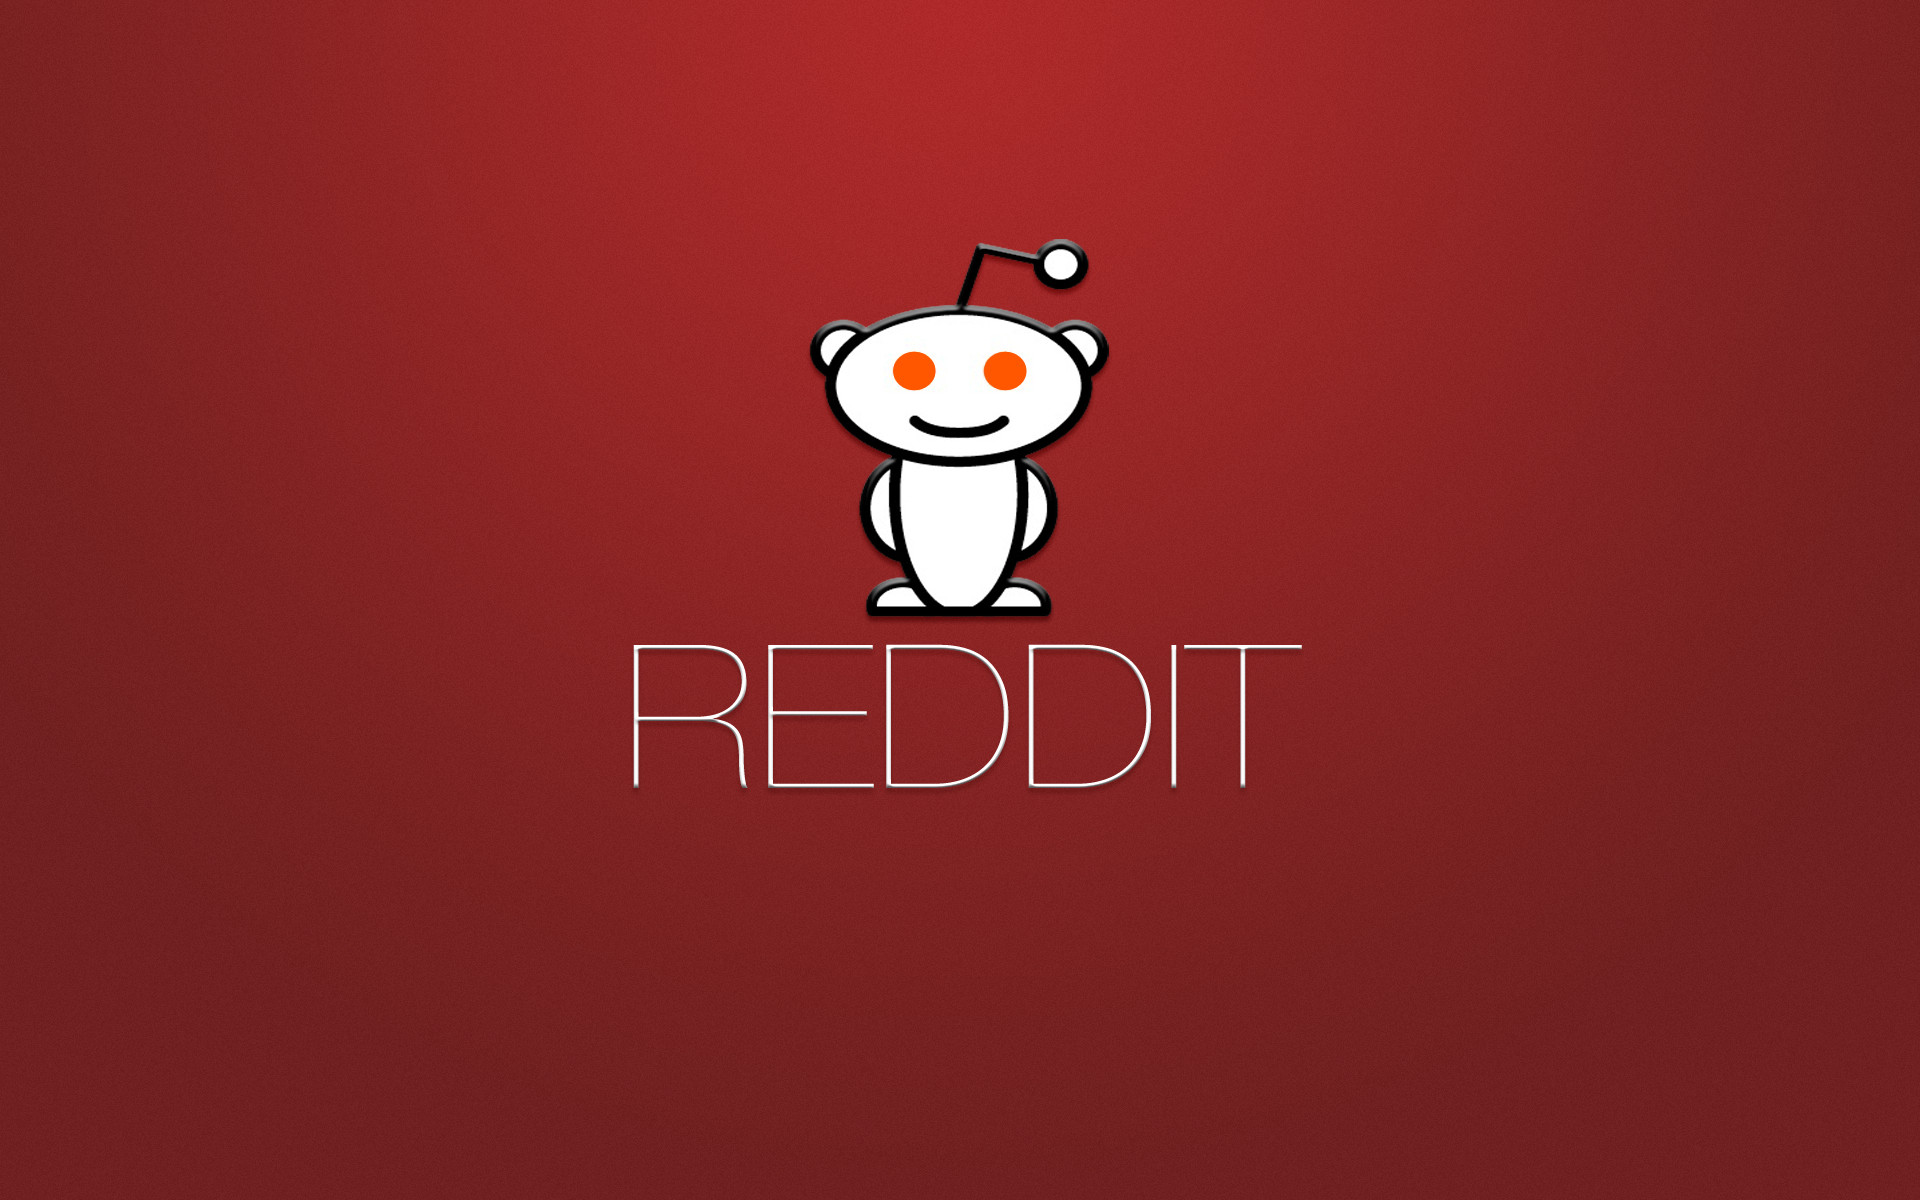 Cool Pc Backgrounds Reddit